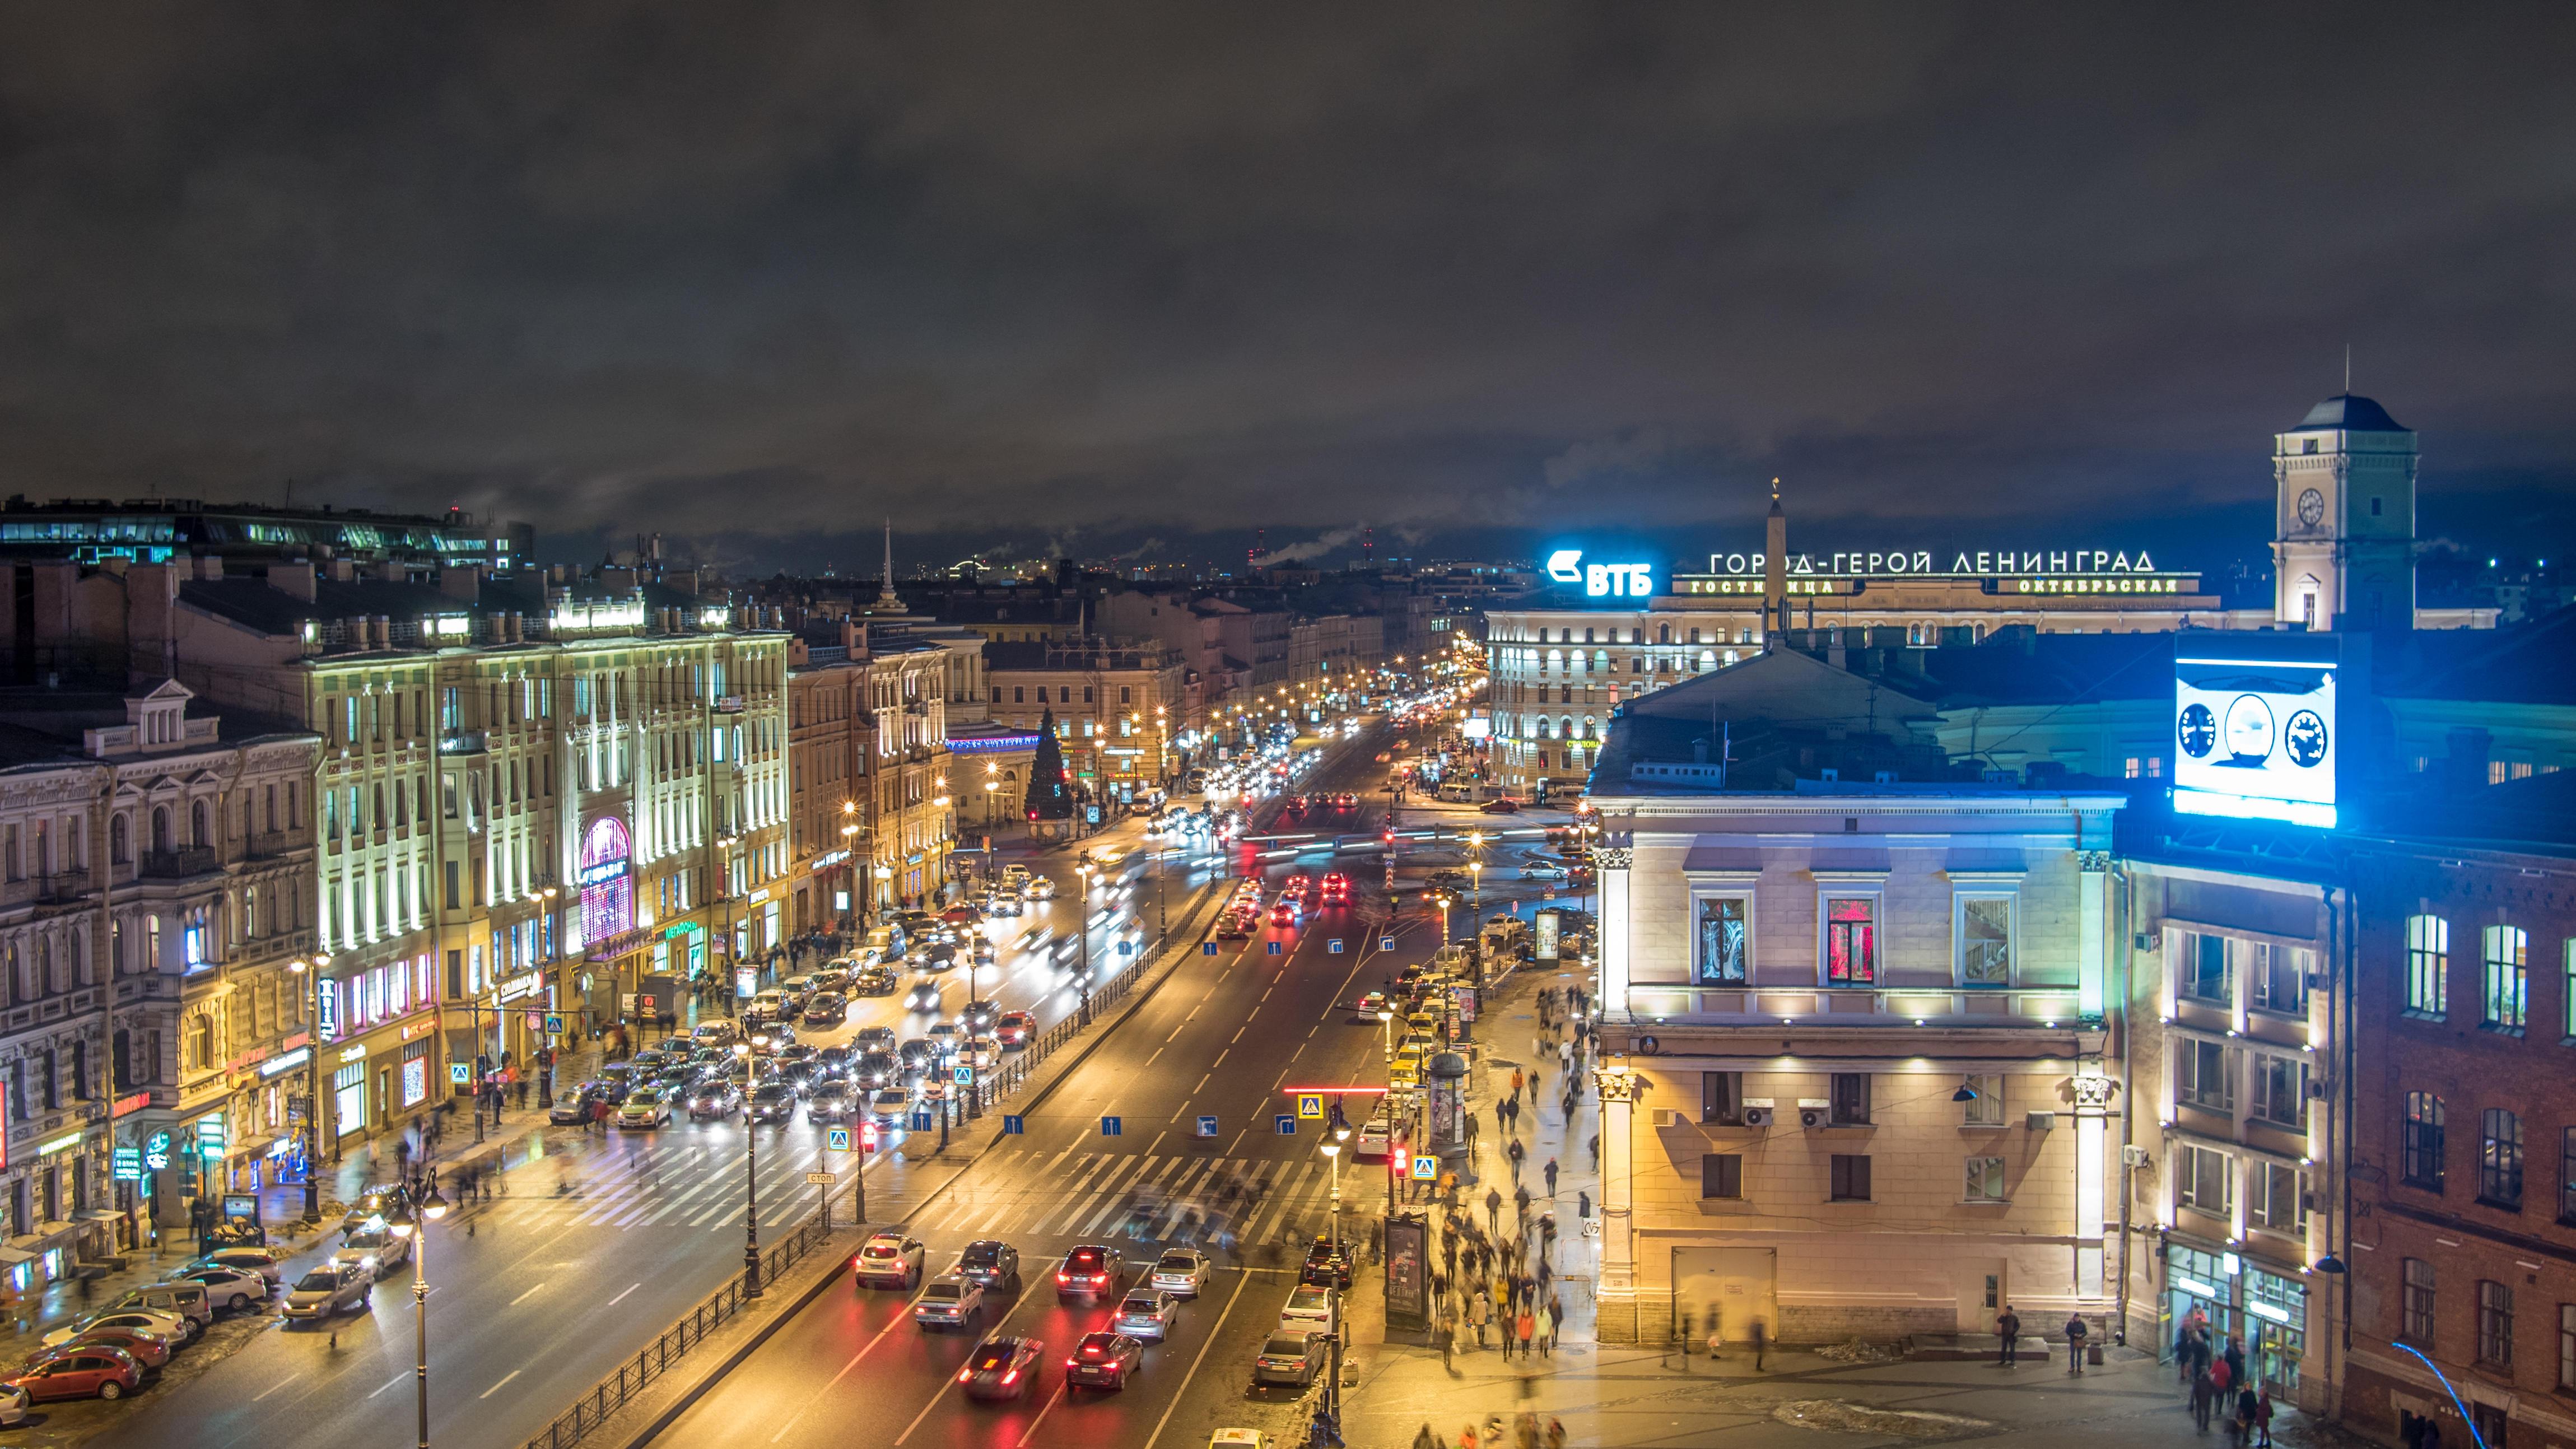 обои Площадь Восстания, Санкт-Петербург картинки фото